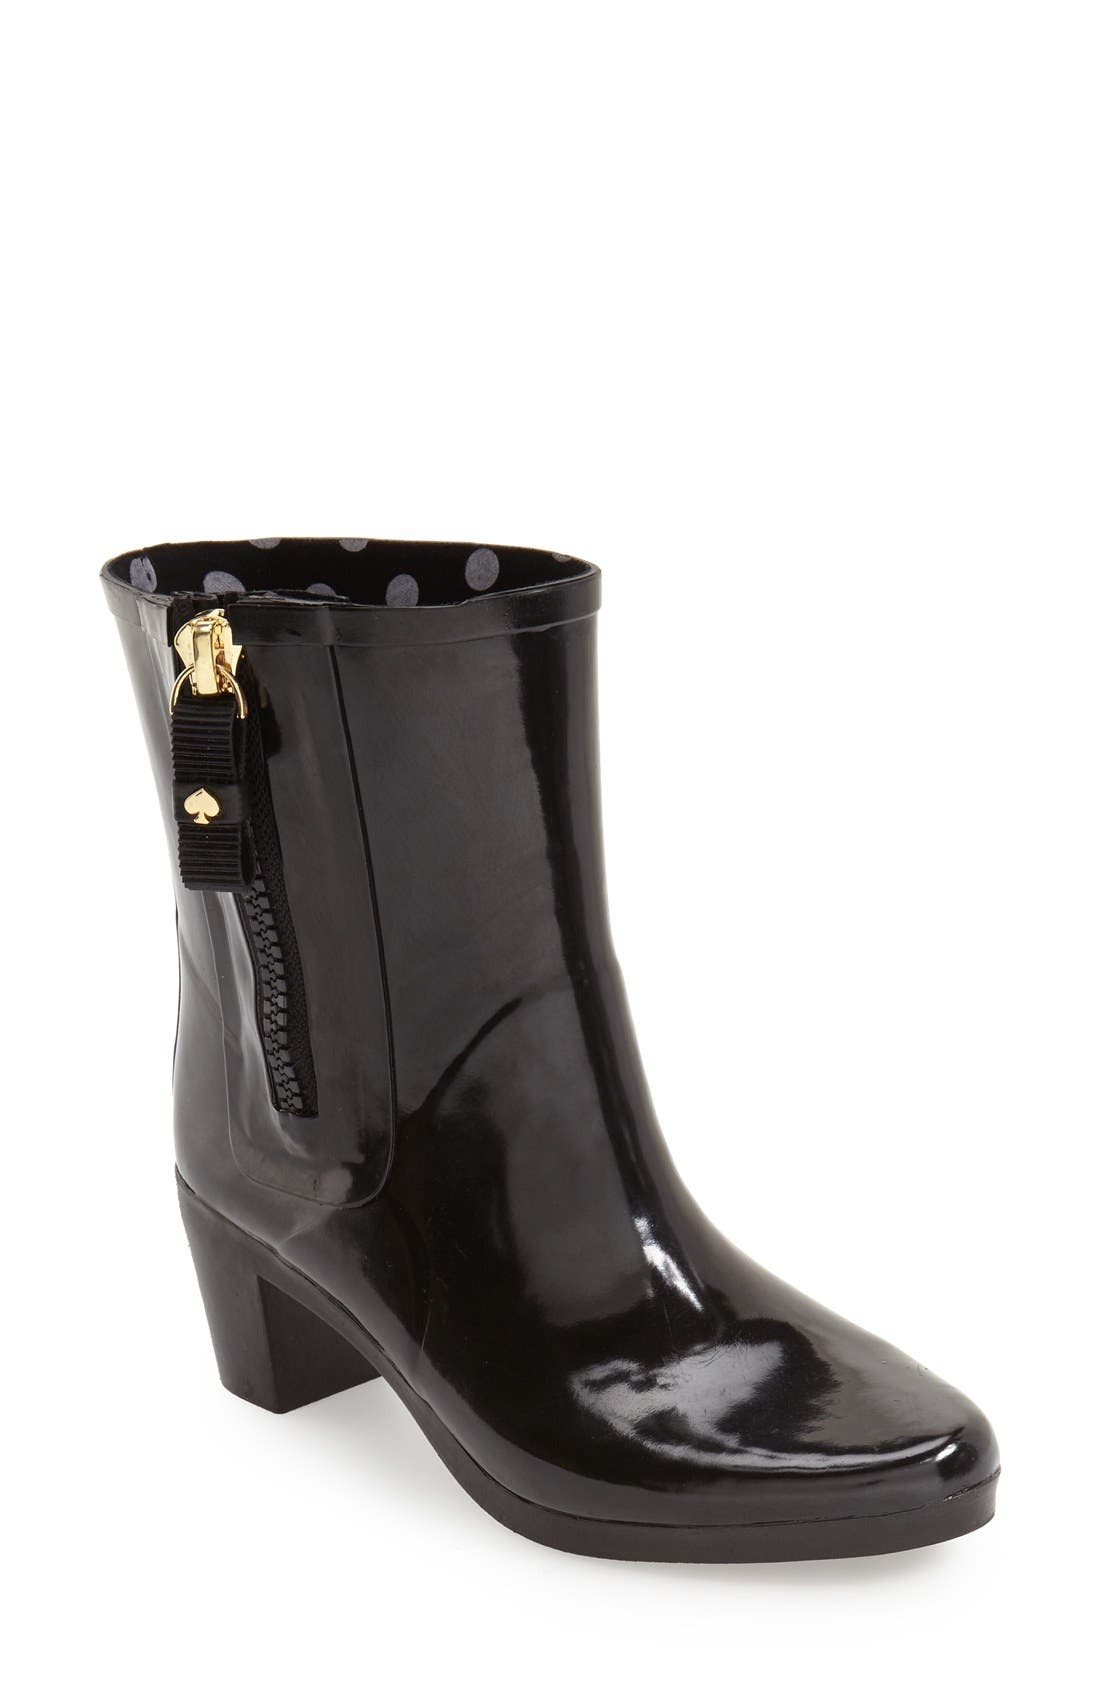 Main Image - kate spade new york 'penny' rain boot (Women)